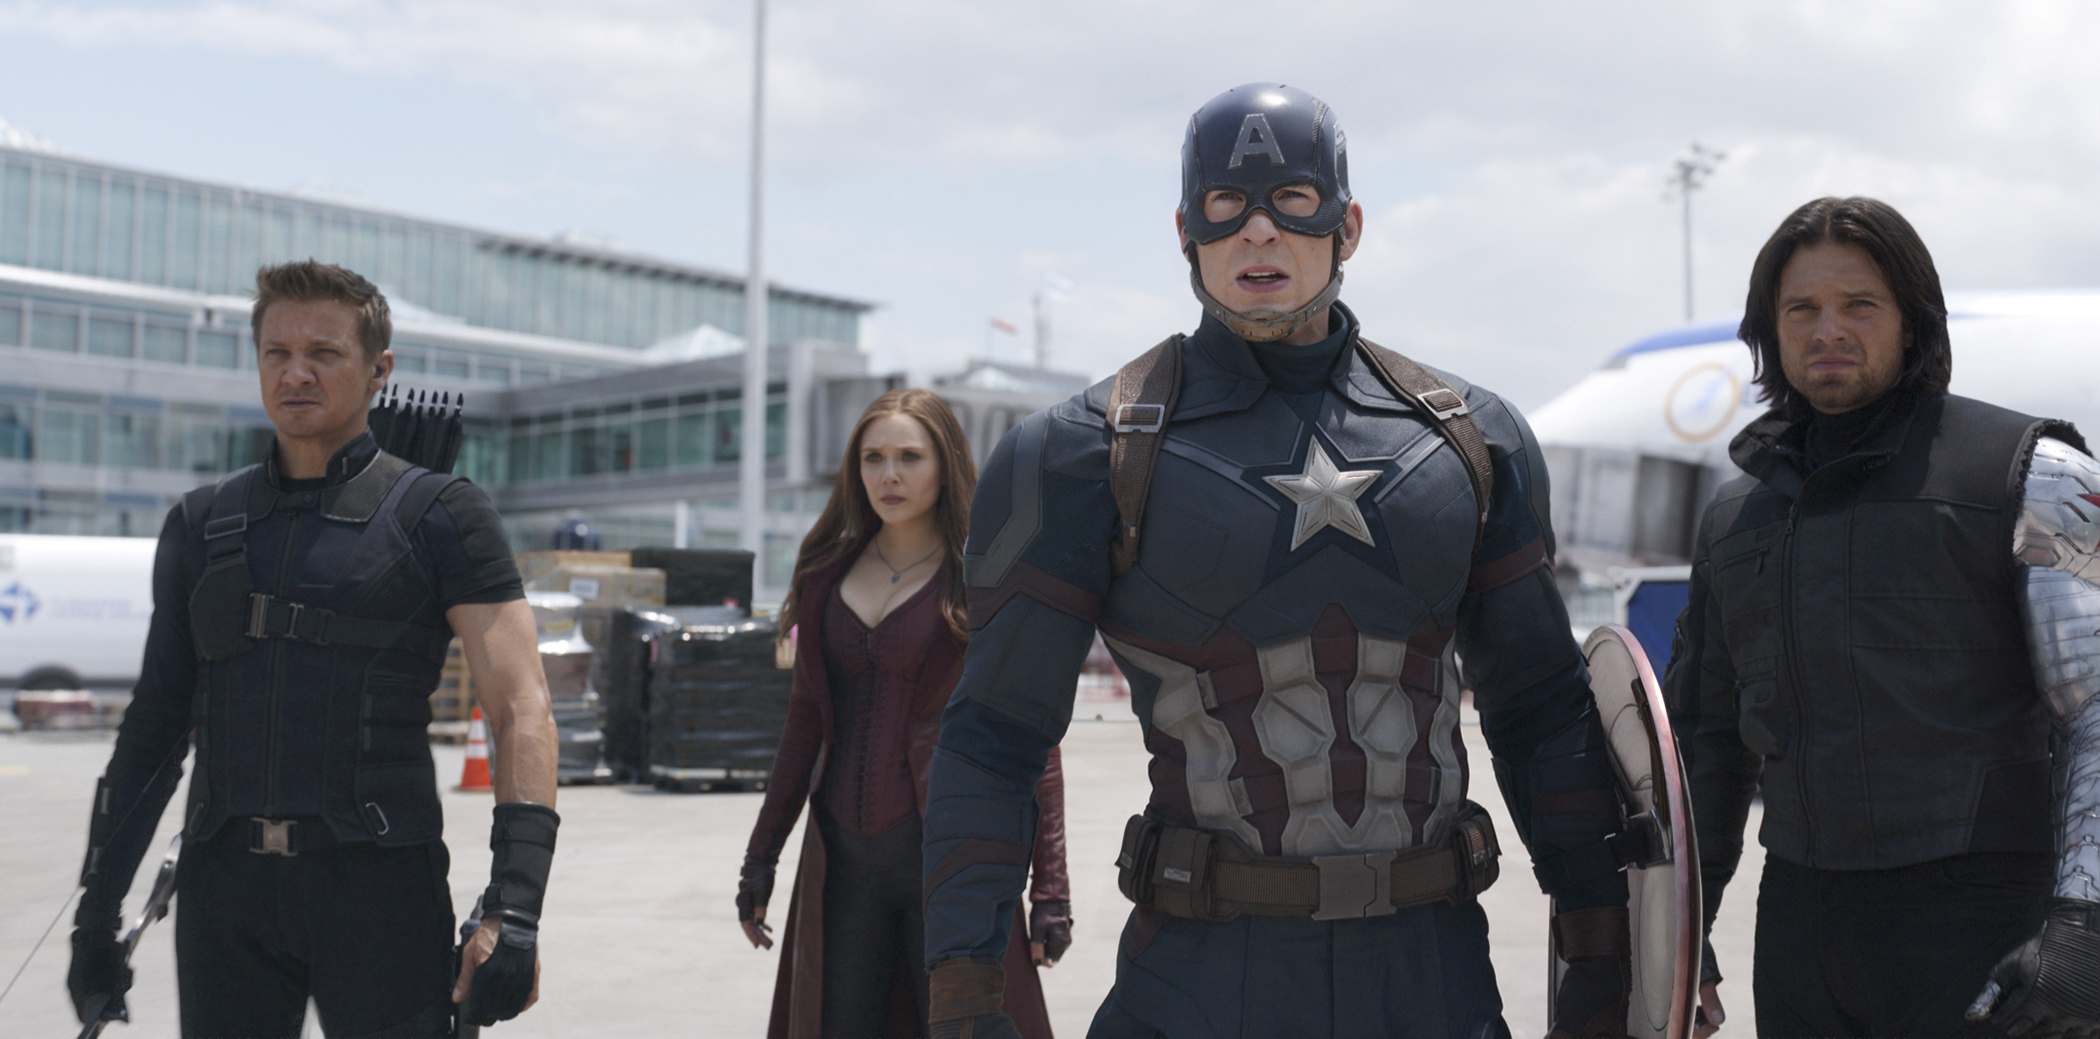 Marvel's Captain America: Civil War..L to R: Hawkeye/Clint Barton (Jeremy Renner), Scarlet Witch/Wanda Maximoff (Elizabeth Olsen), Captain America/Steve Rogers (Chris Evans), and Winter Soldier/Bucky Barnes (Sebastian Stan).